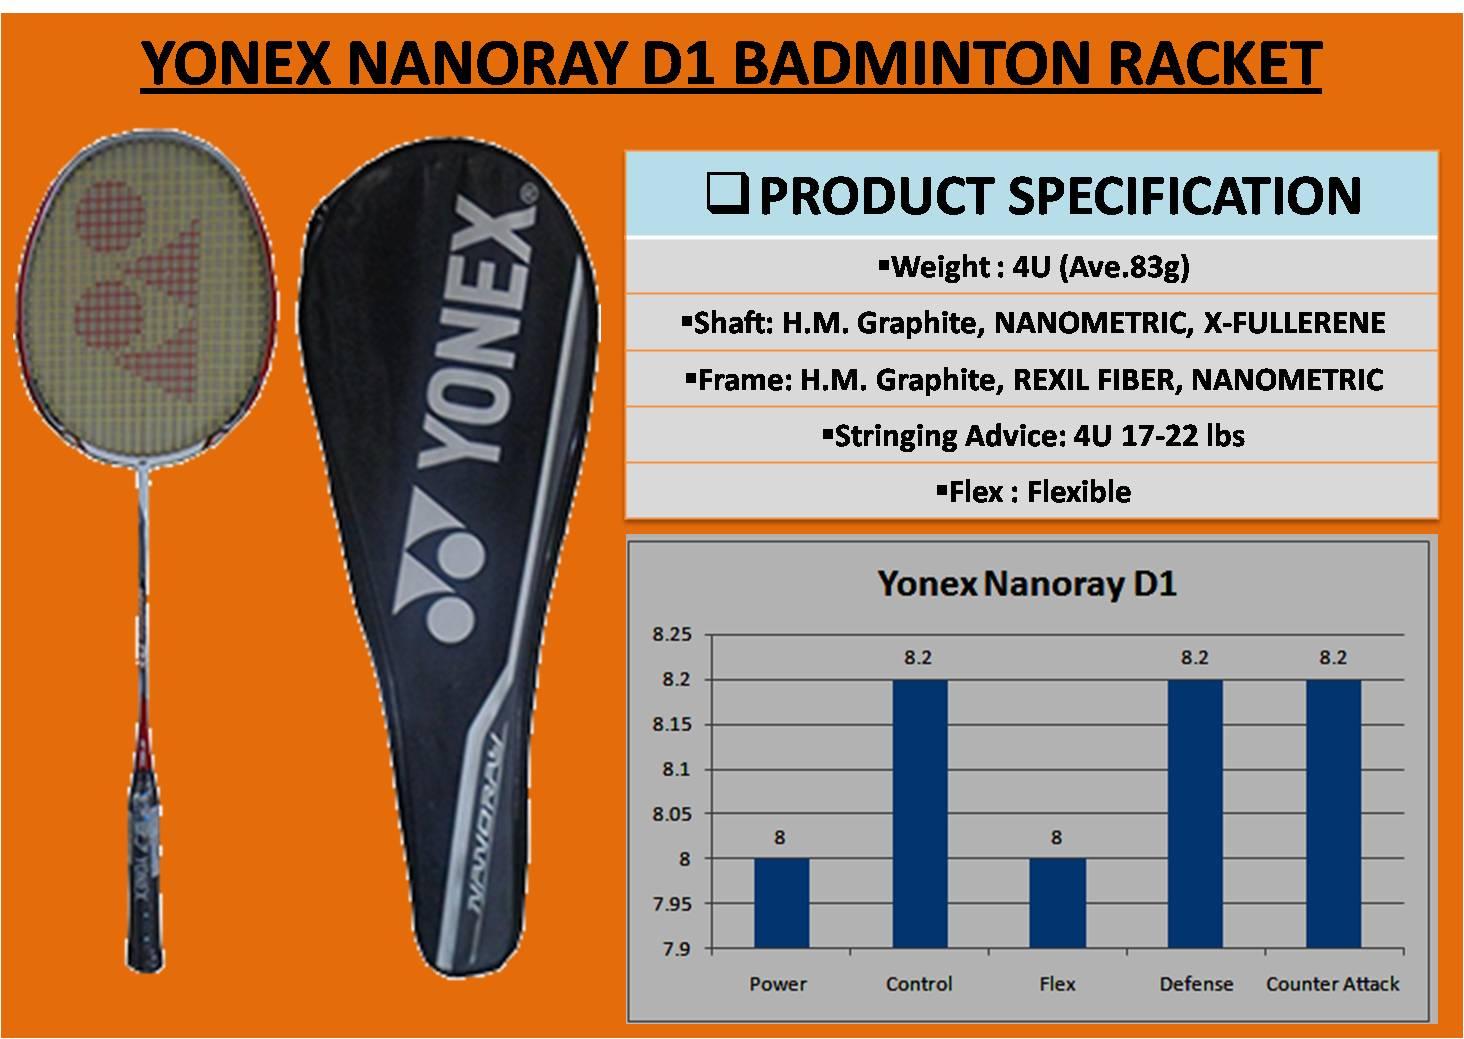 YONEX NANORAY D1 BADMINTON RACKET_3